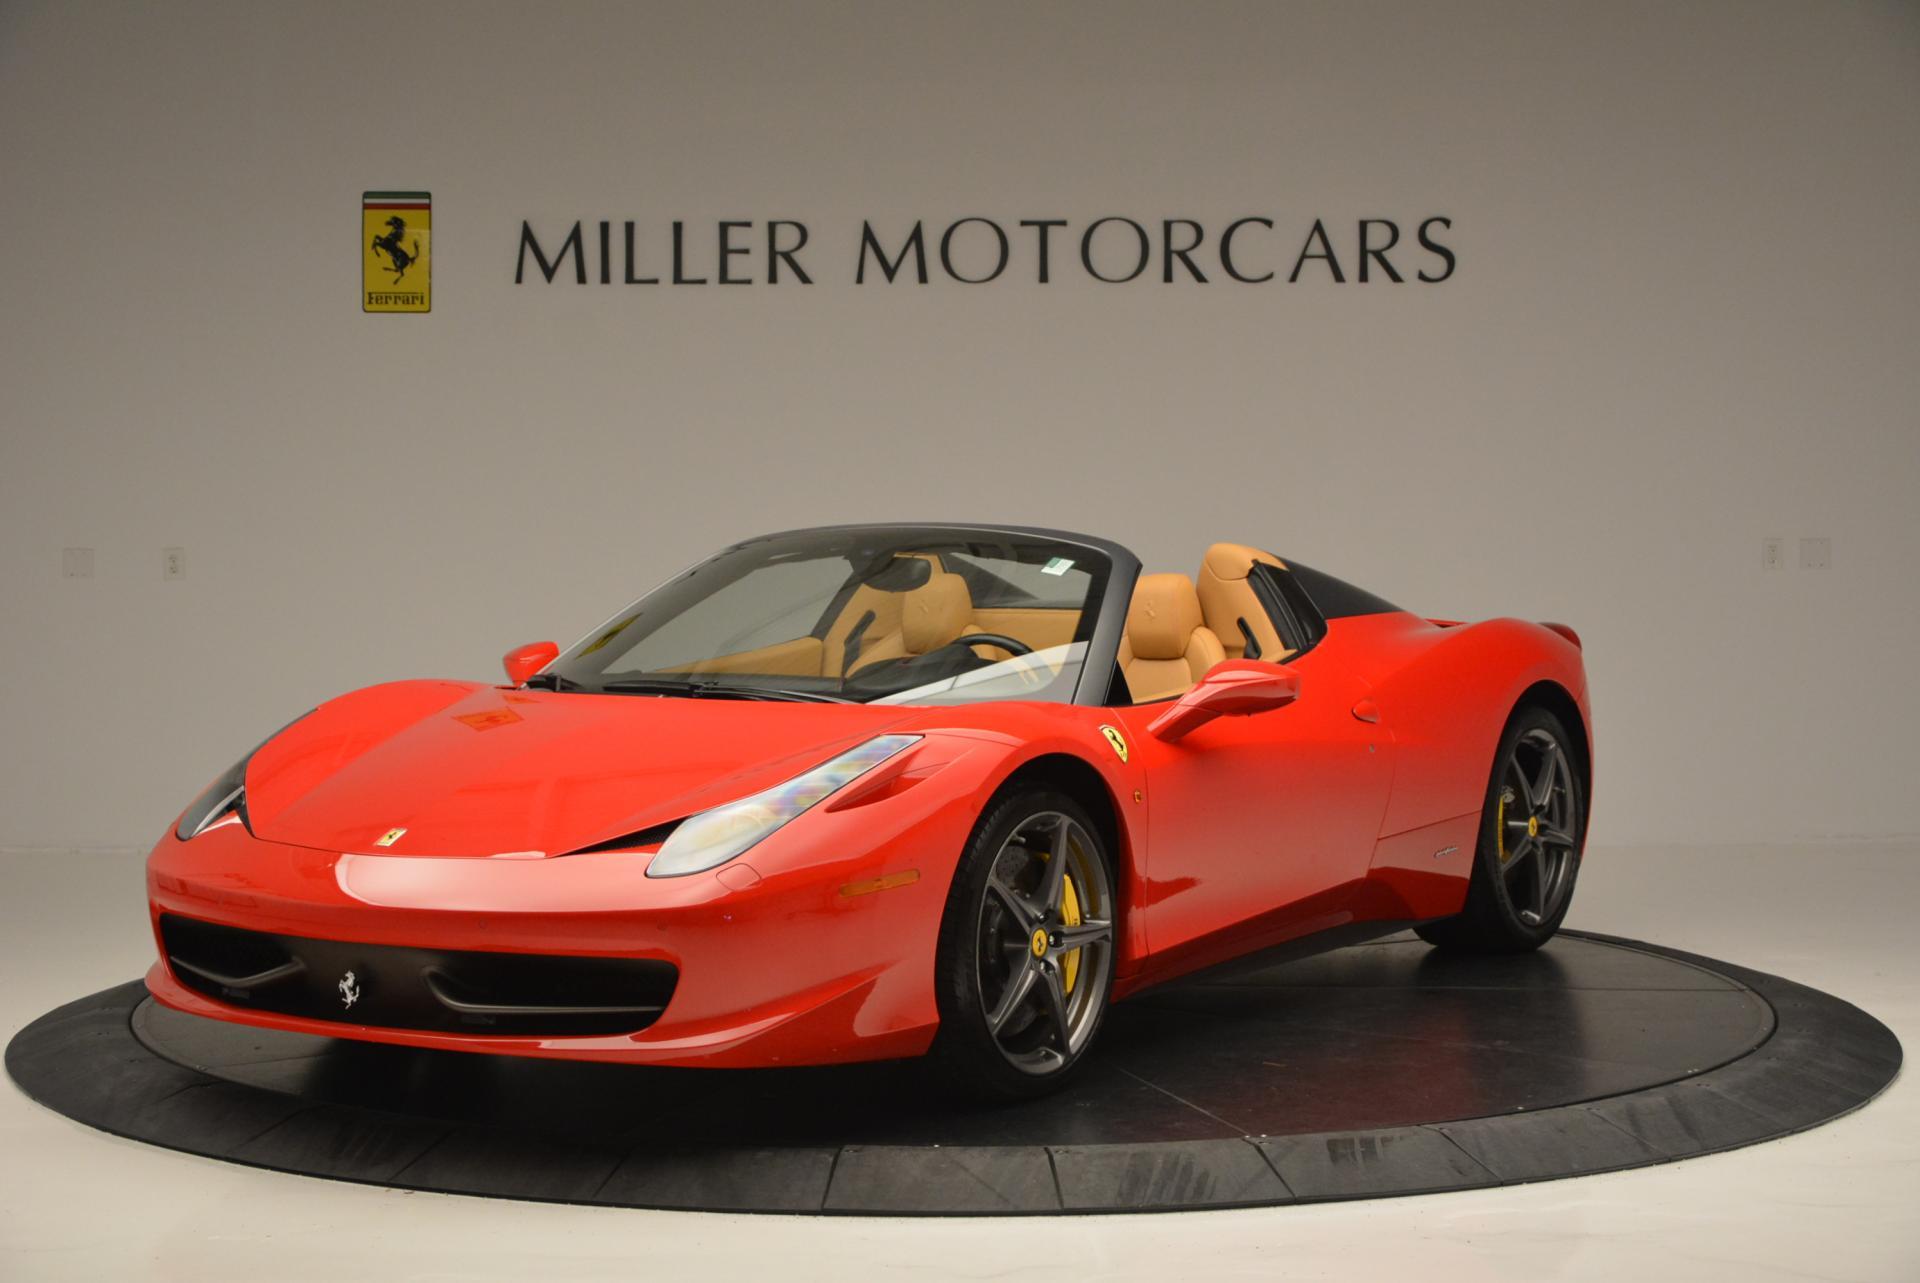 Used 2013 Ferrari 458 Spider for sale Sold at Maserati of Westport in Westport CT 06880 1